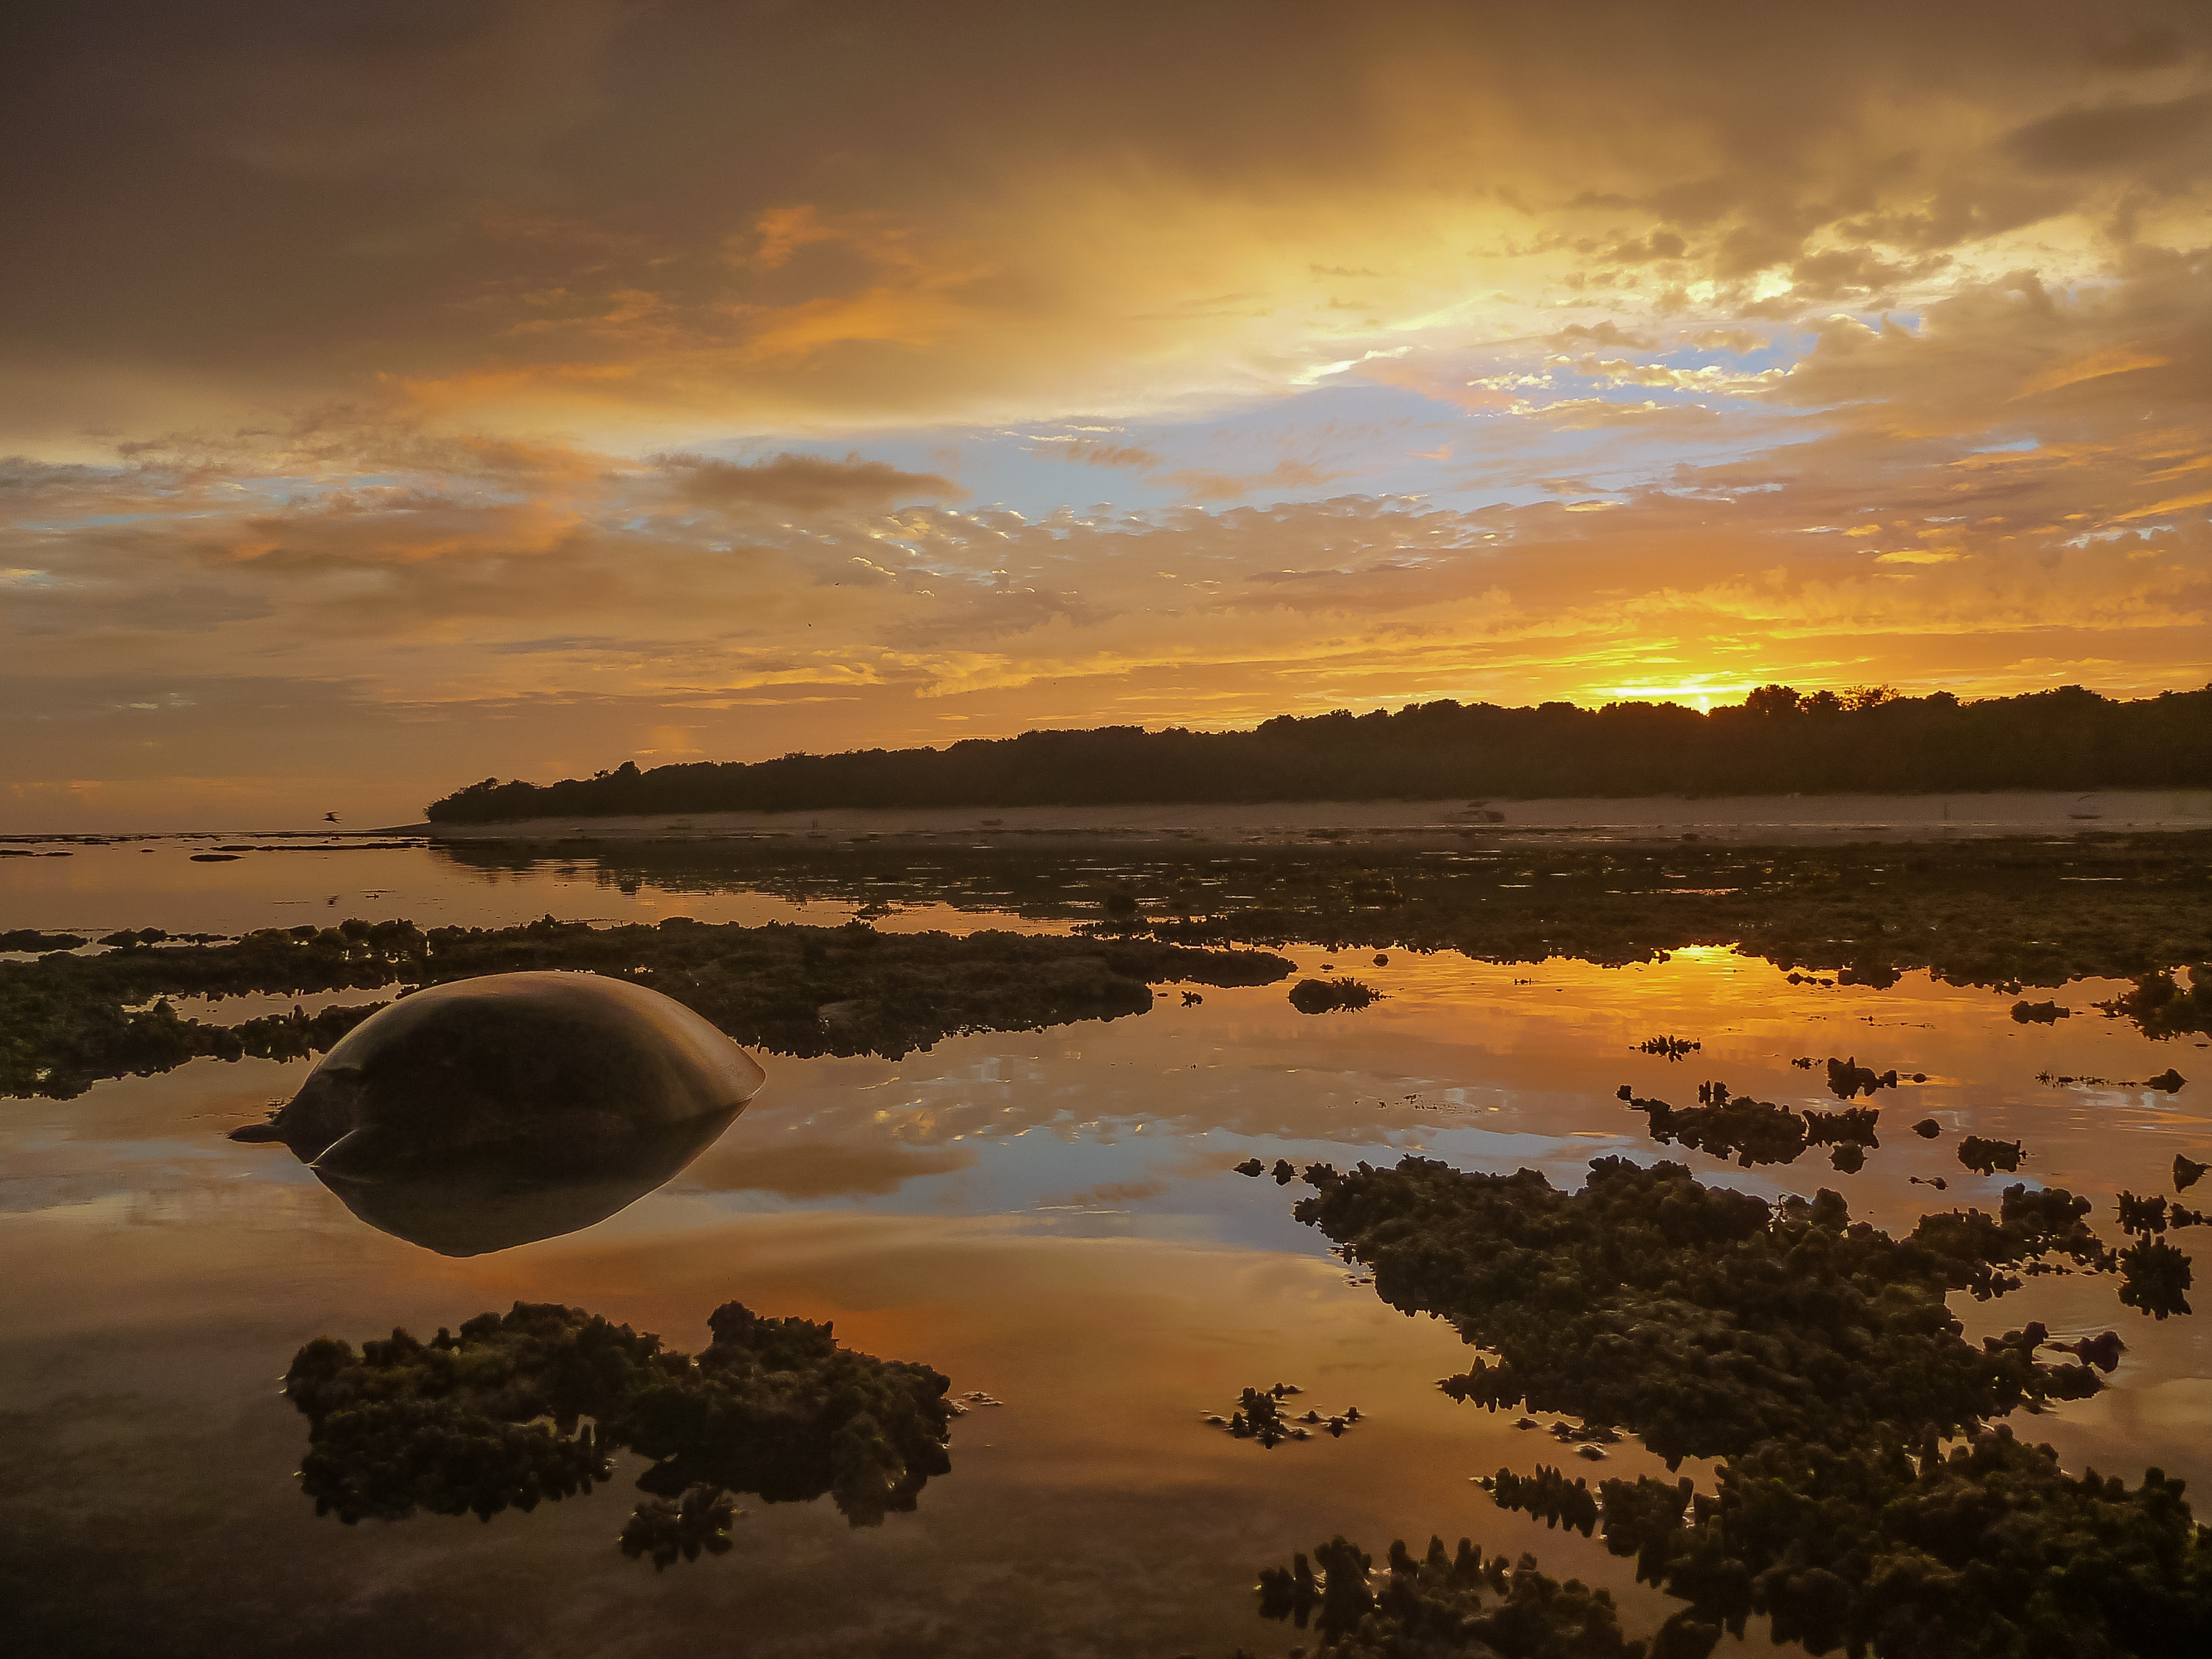 Turtle Awaits the Tide by John McGrath